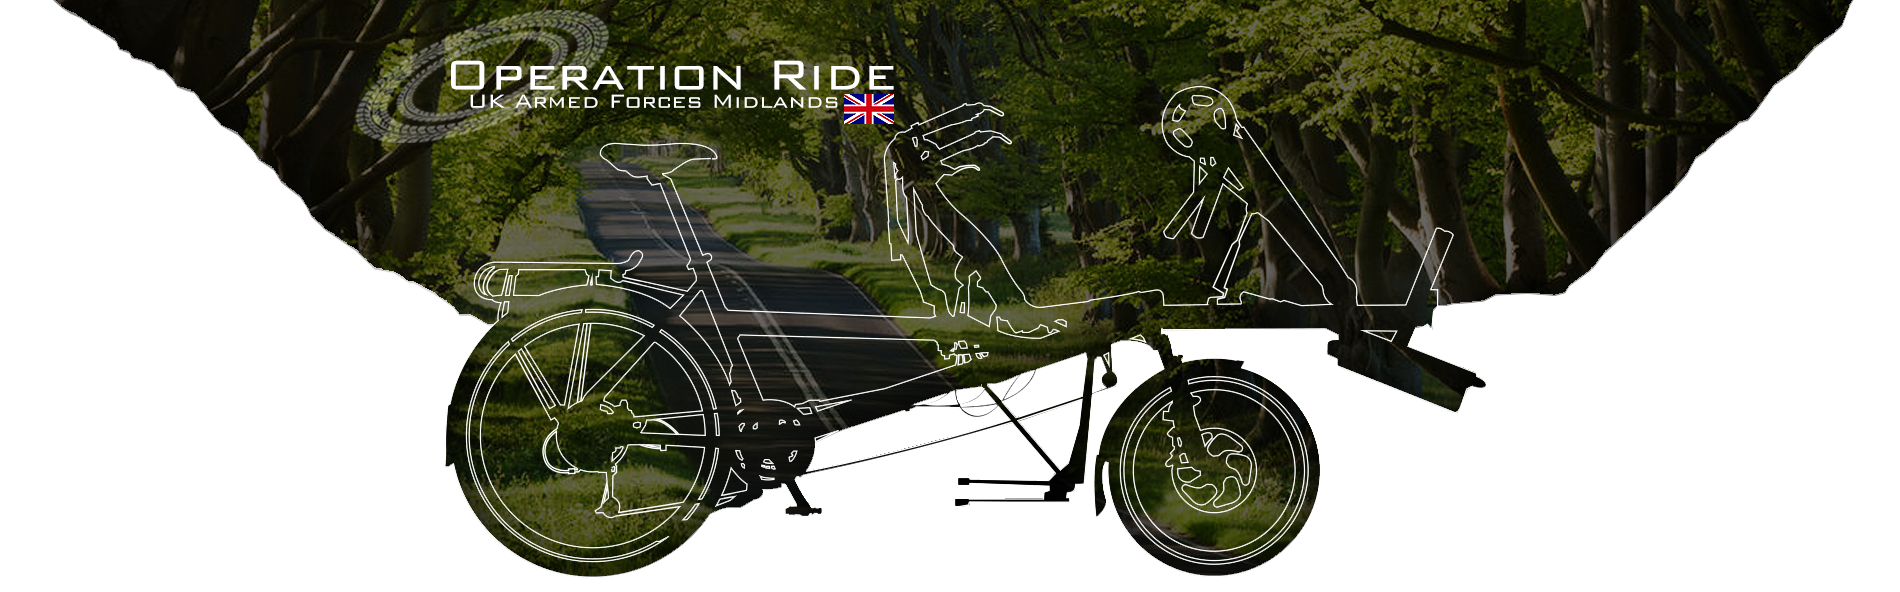 BLOG OpRide UK1